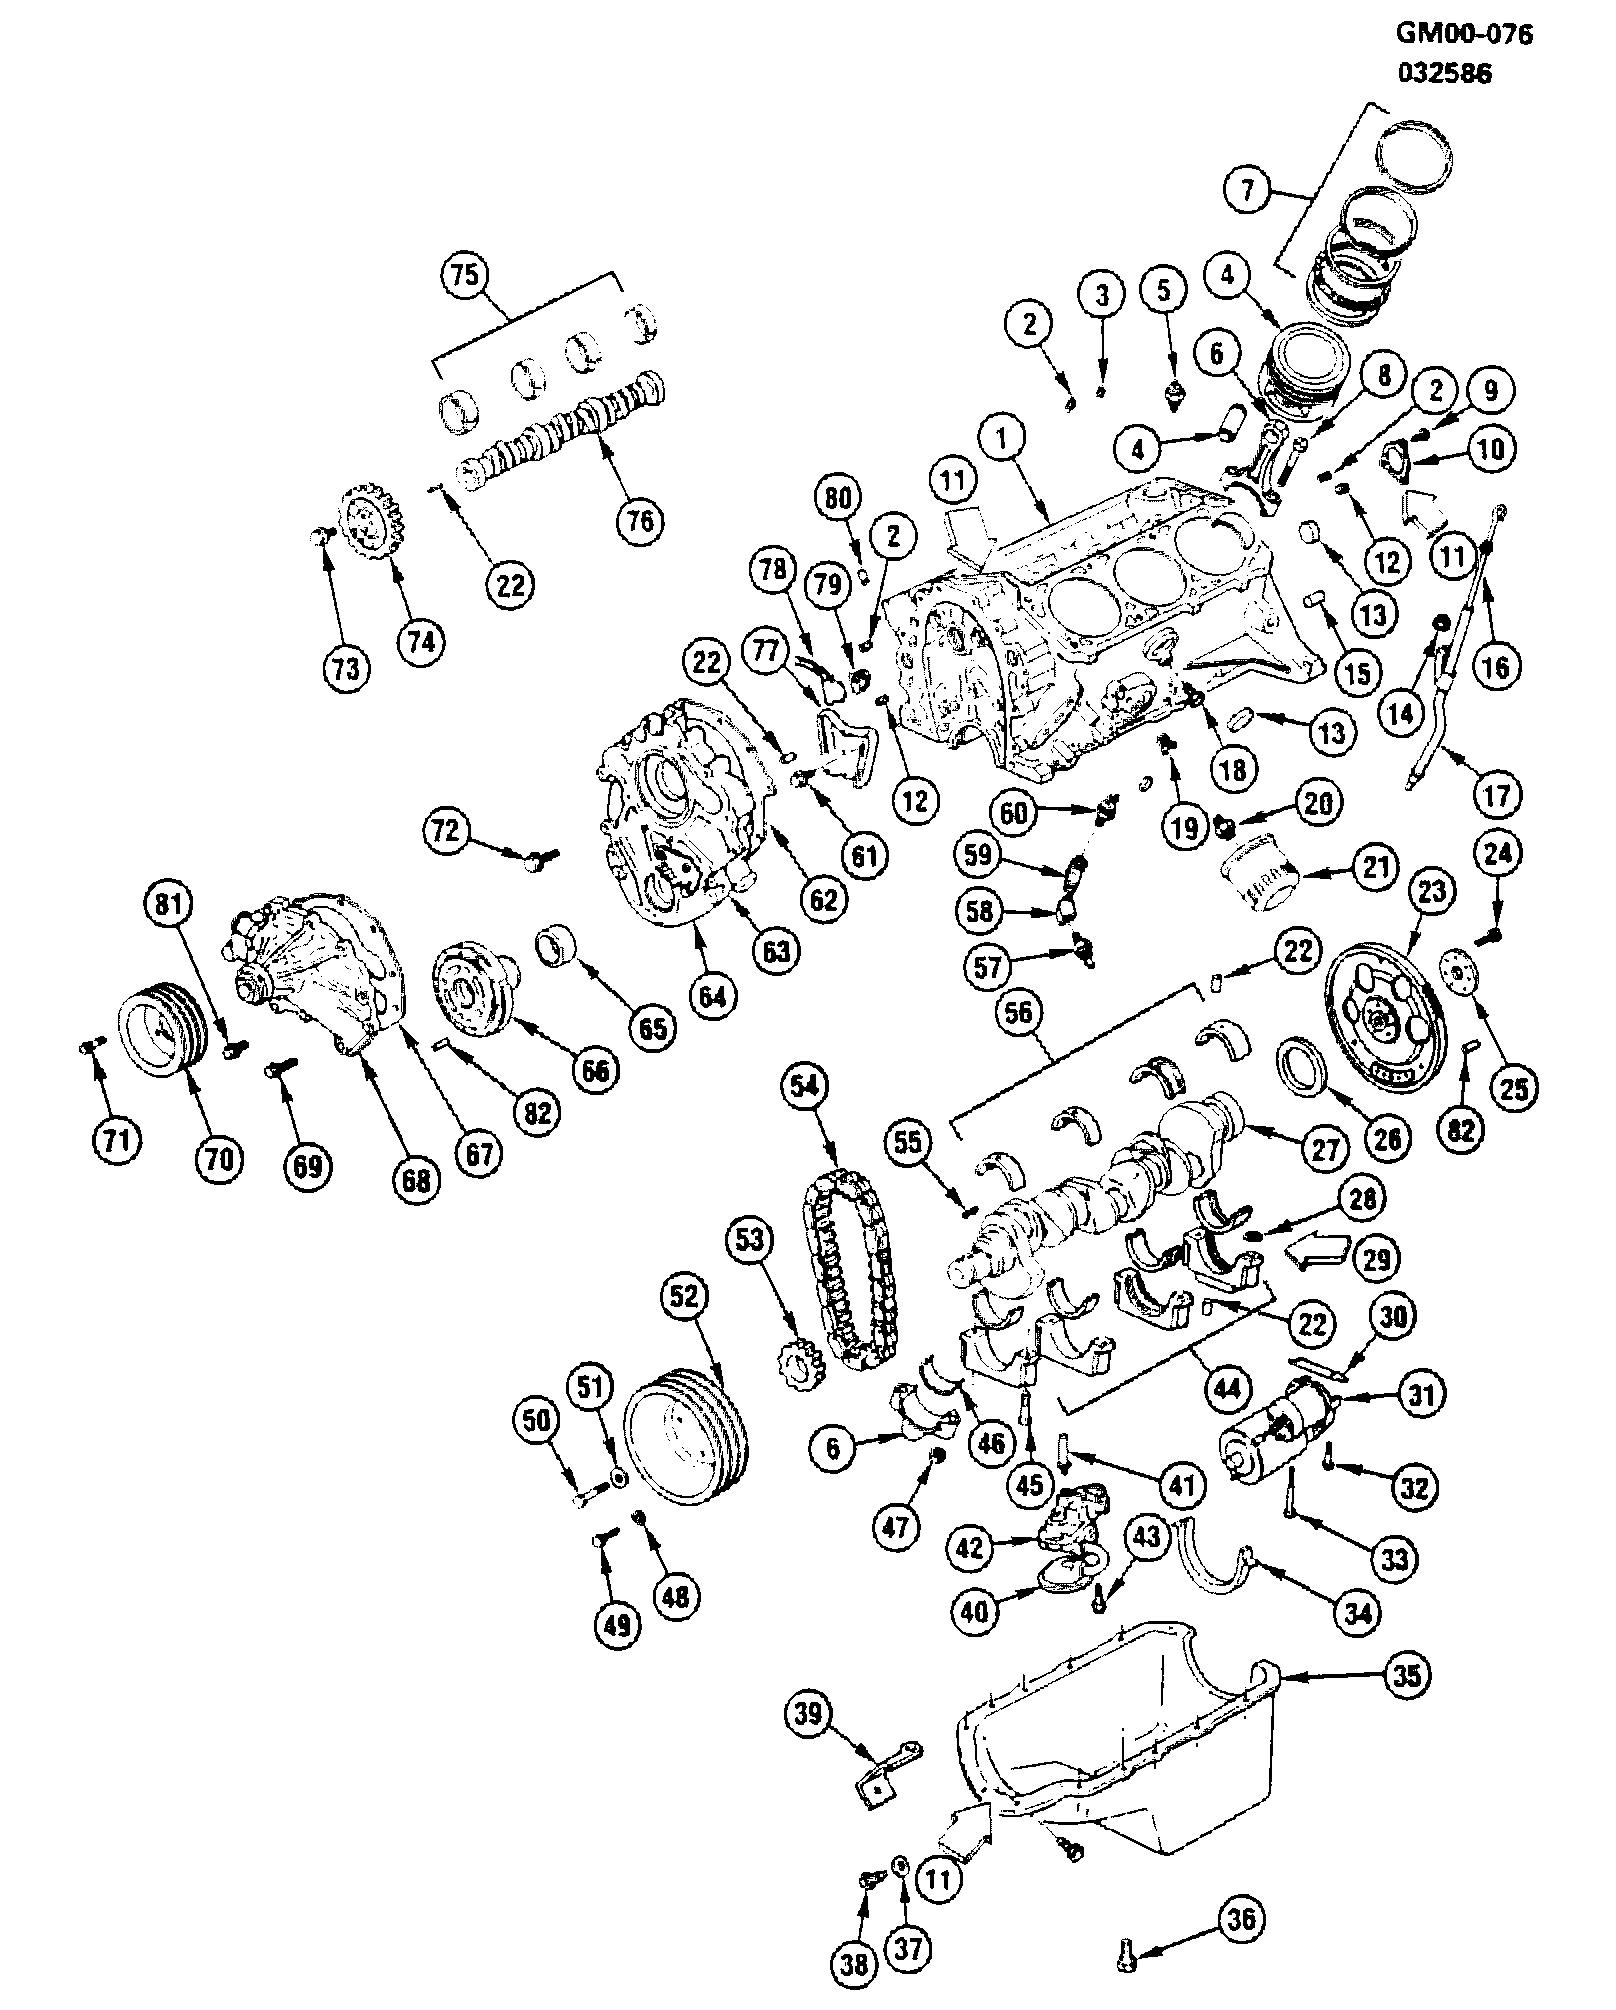 Oldsmobile Cutlass Ciera (FWD) - A ENGINE ASM-2.8L V6 PART 1 (LB6/2.8W) >  EPC Online > Nemiga.com   Chevy 2 8l V6 Engine Diagram      Parts catalogs